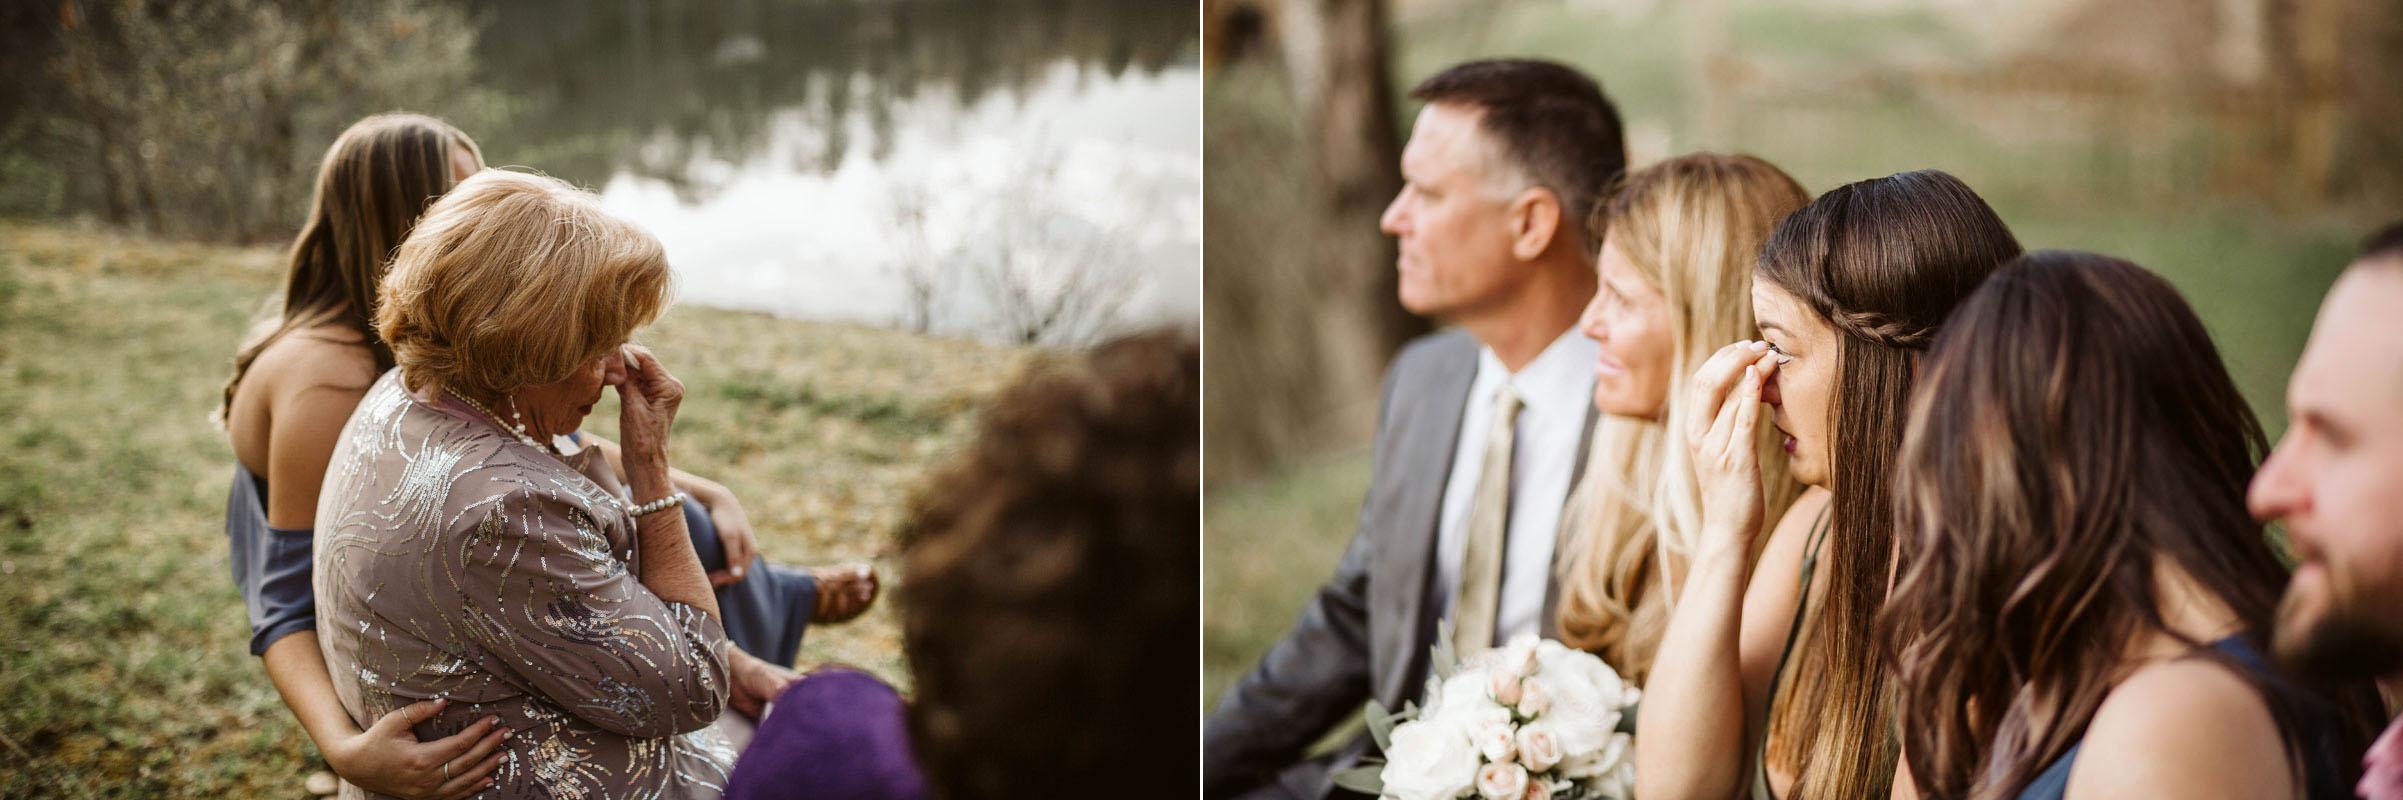 intimate-elopment-blue-ridge-georgia-north-georgia-wedding-photographers (50).jpg